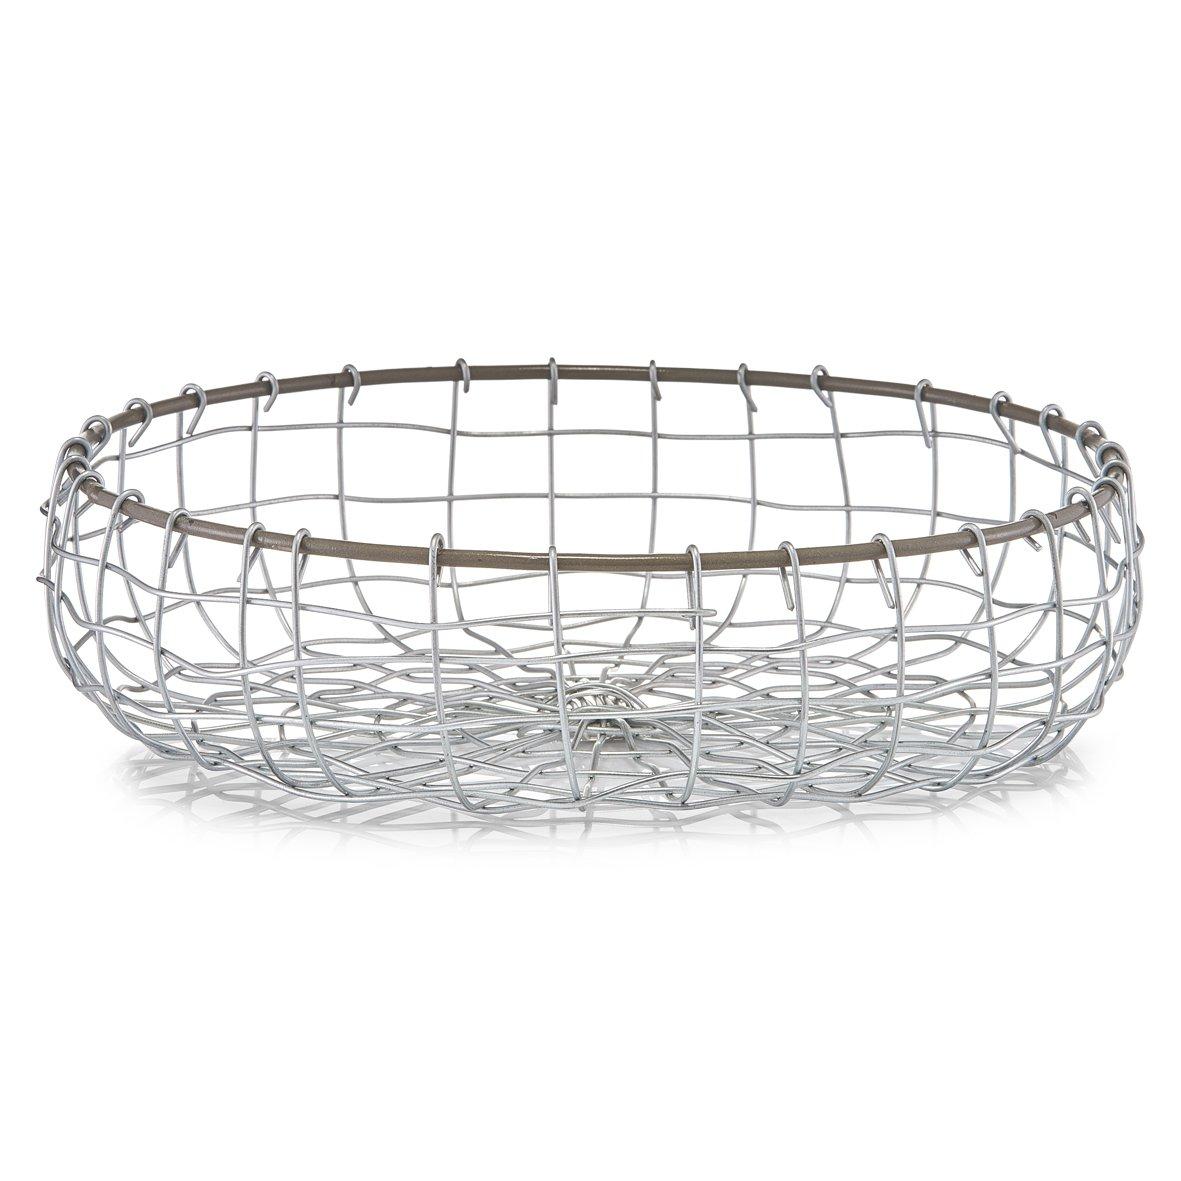 Zeller 27304 Brot-//Obstk/örbchen Metall rund